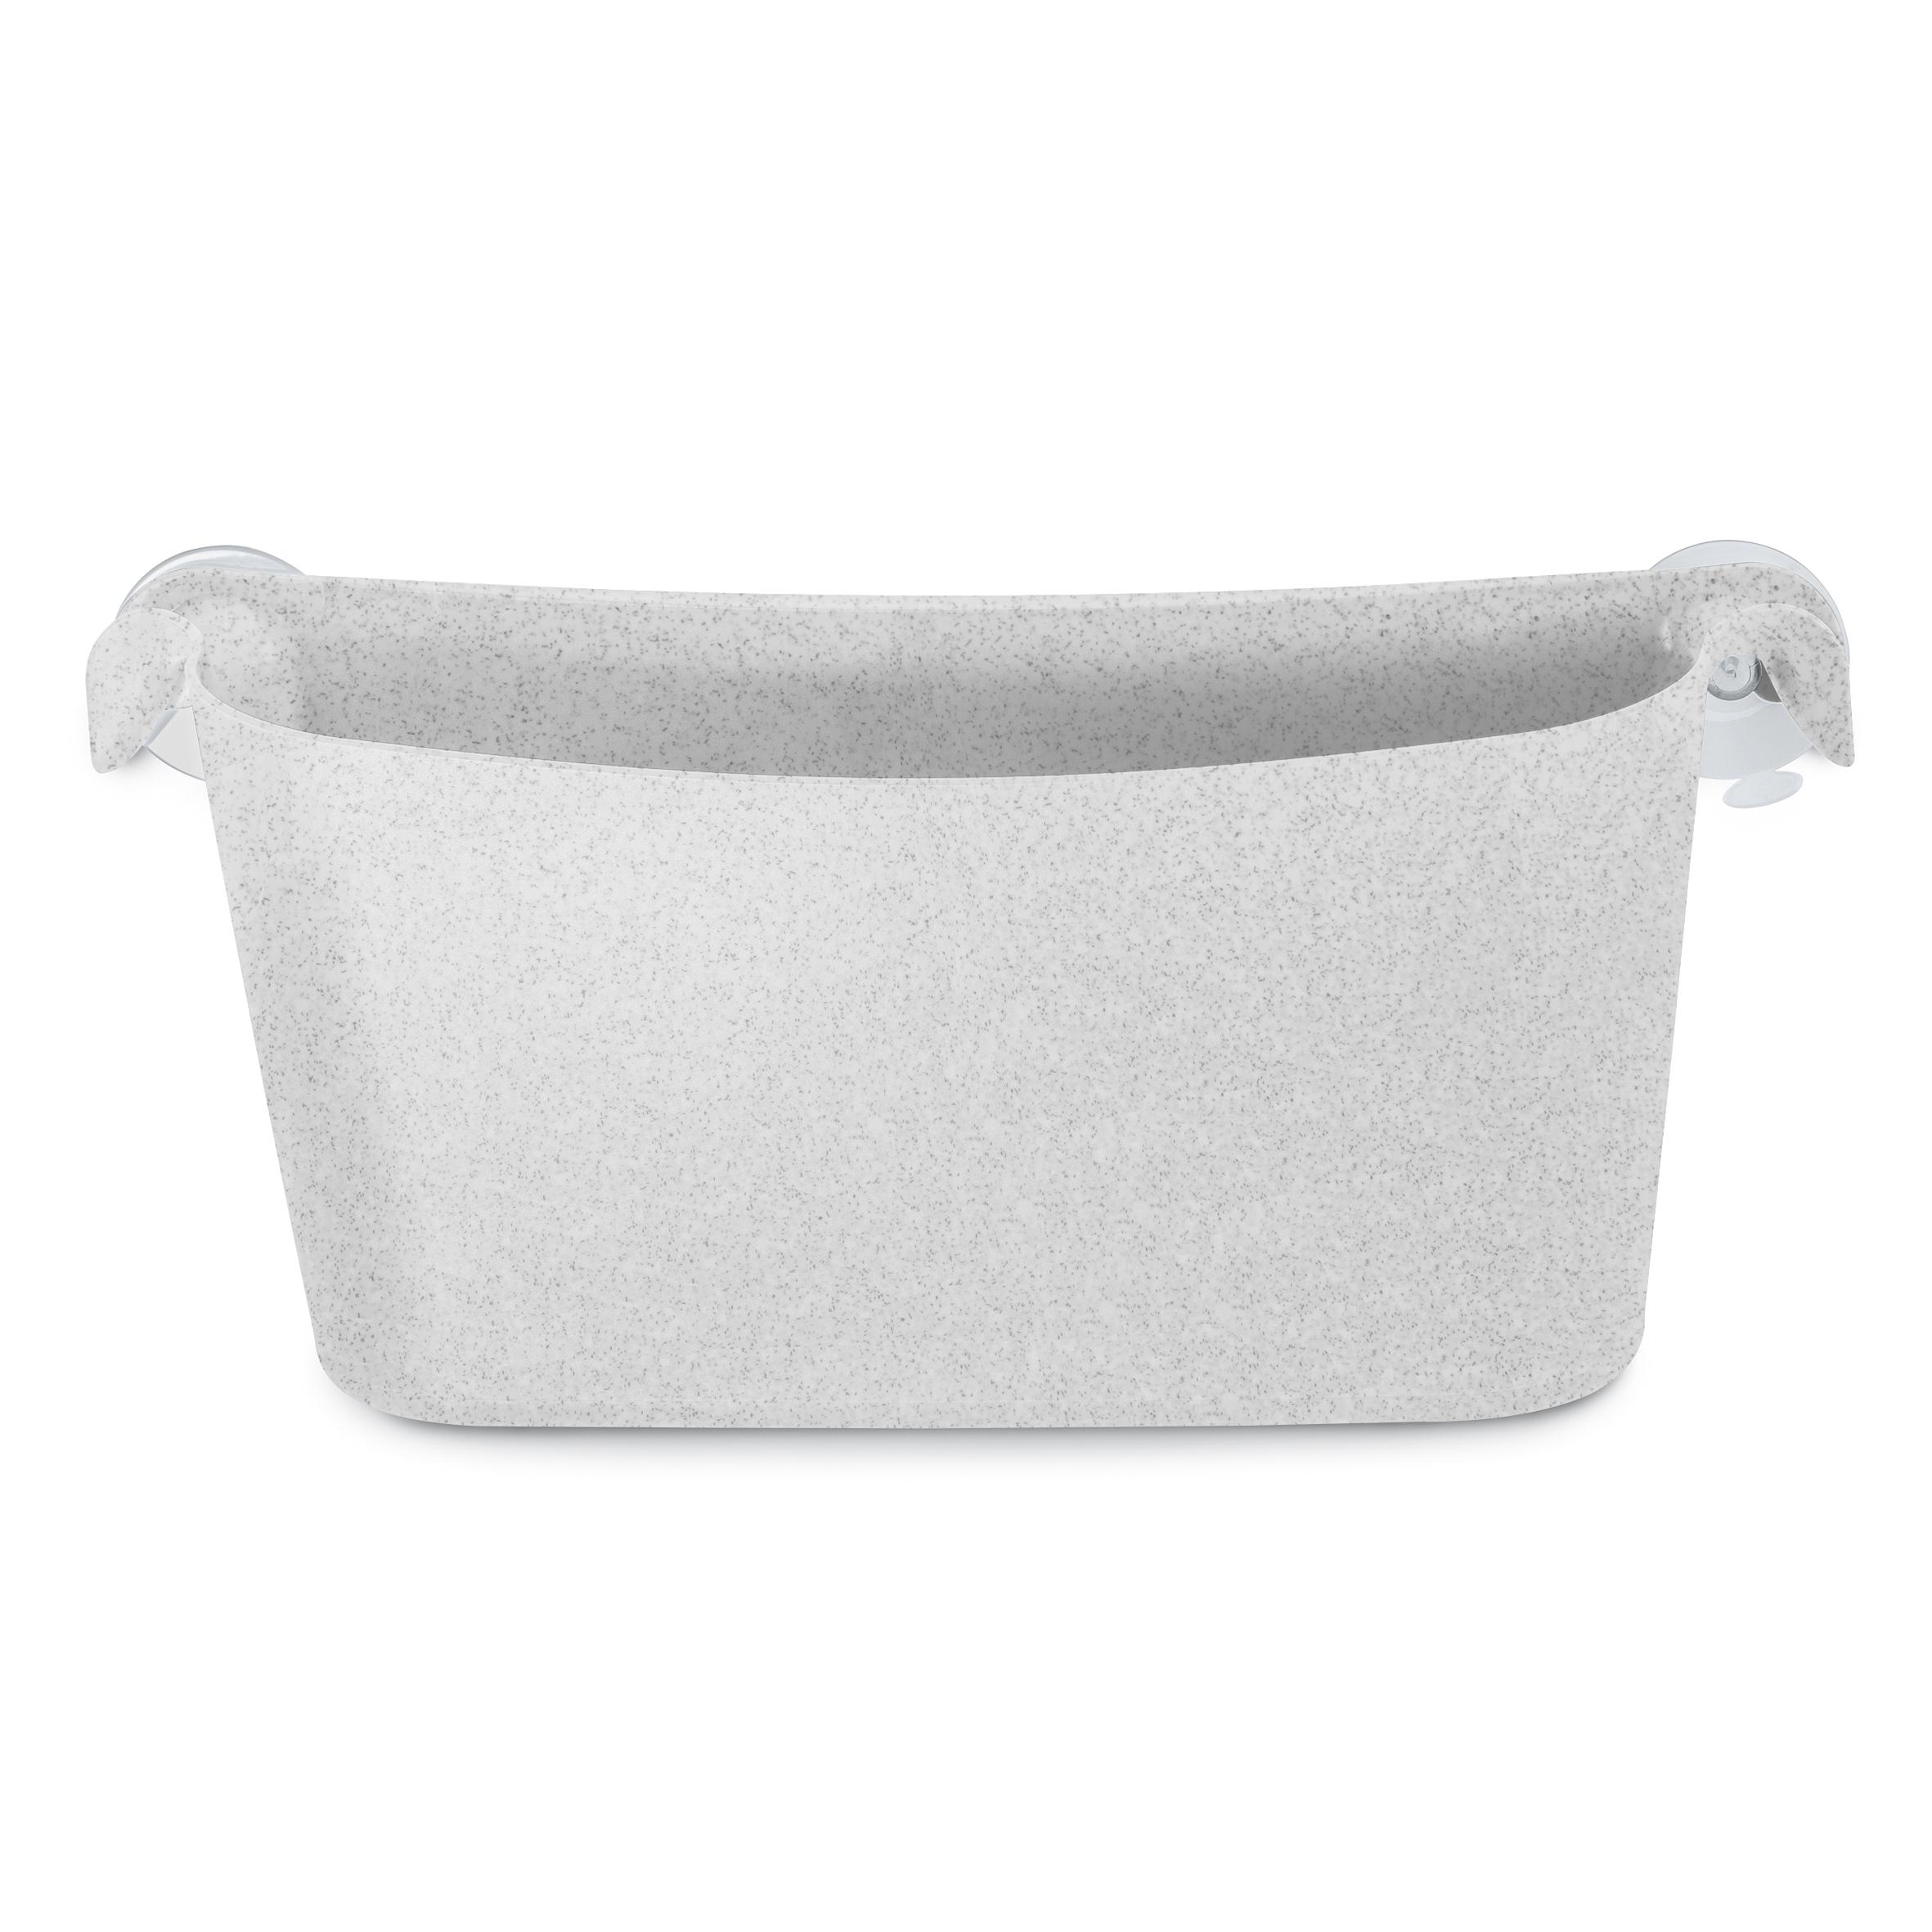 Organizator accesorii pentru baie, din termoplastic, Boks Gri, l35xA10,5xH15,8 cm imagine